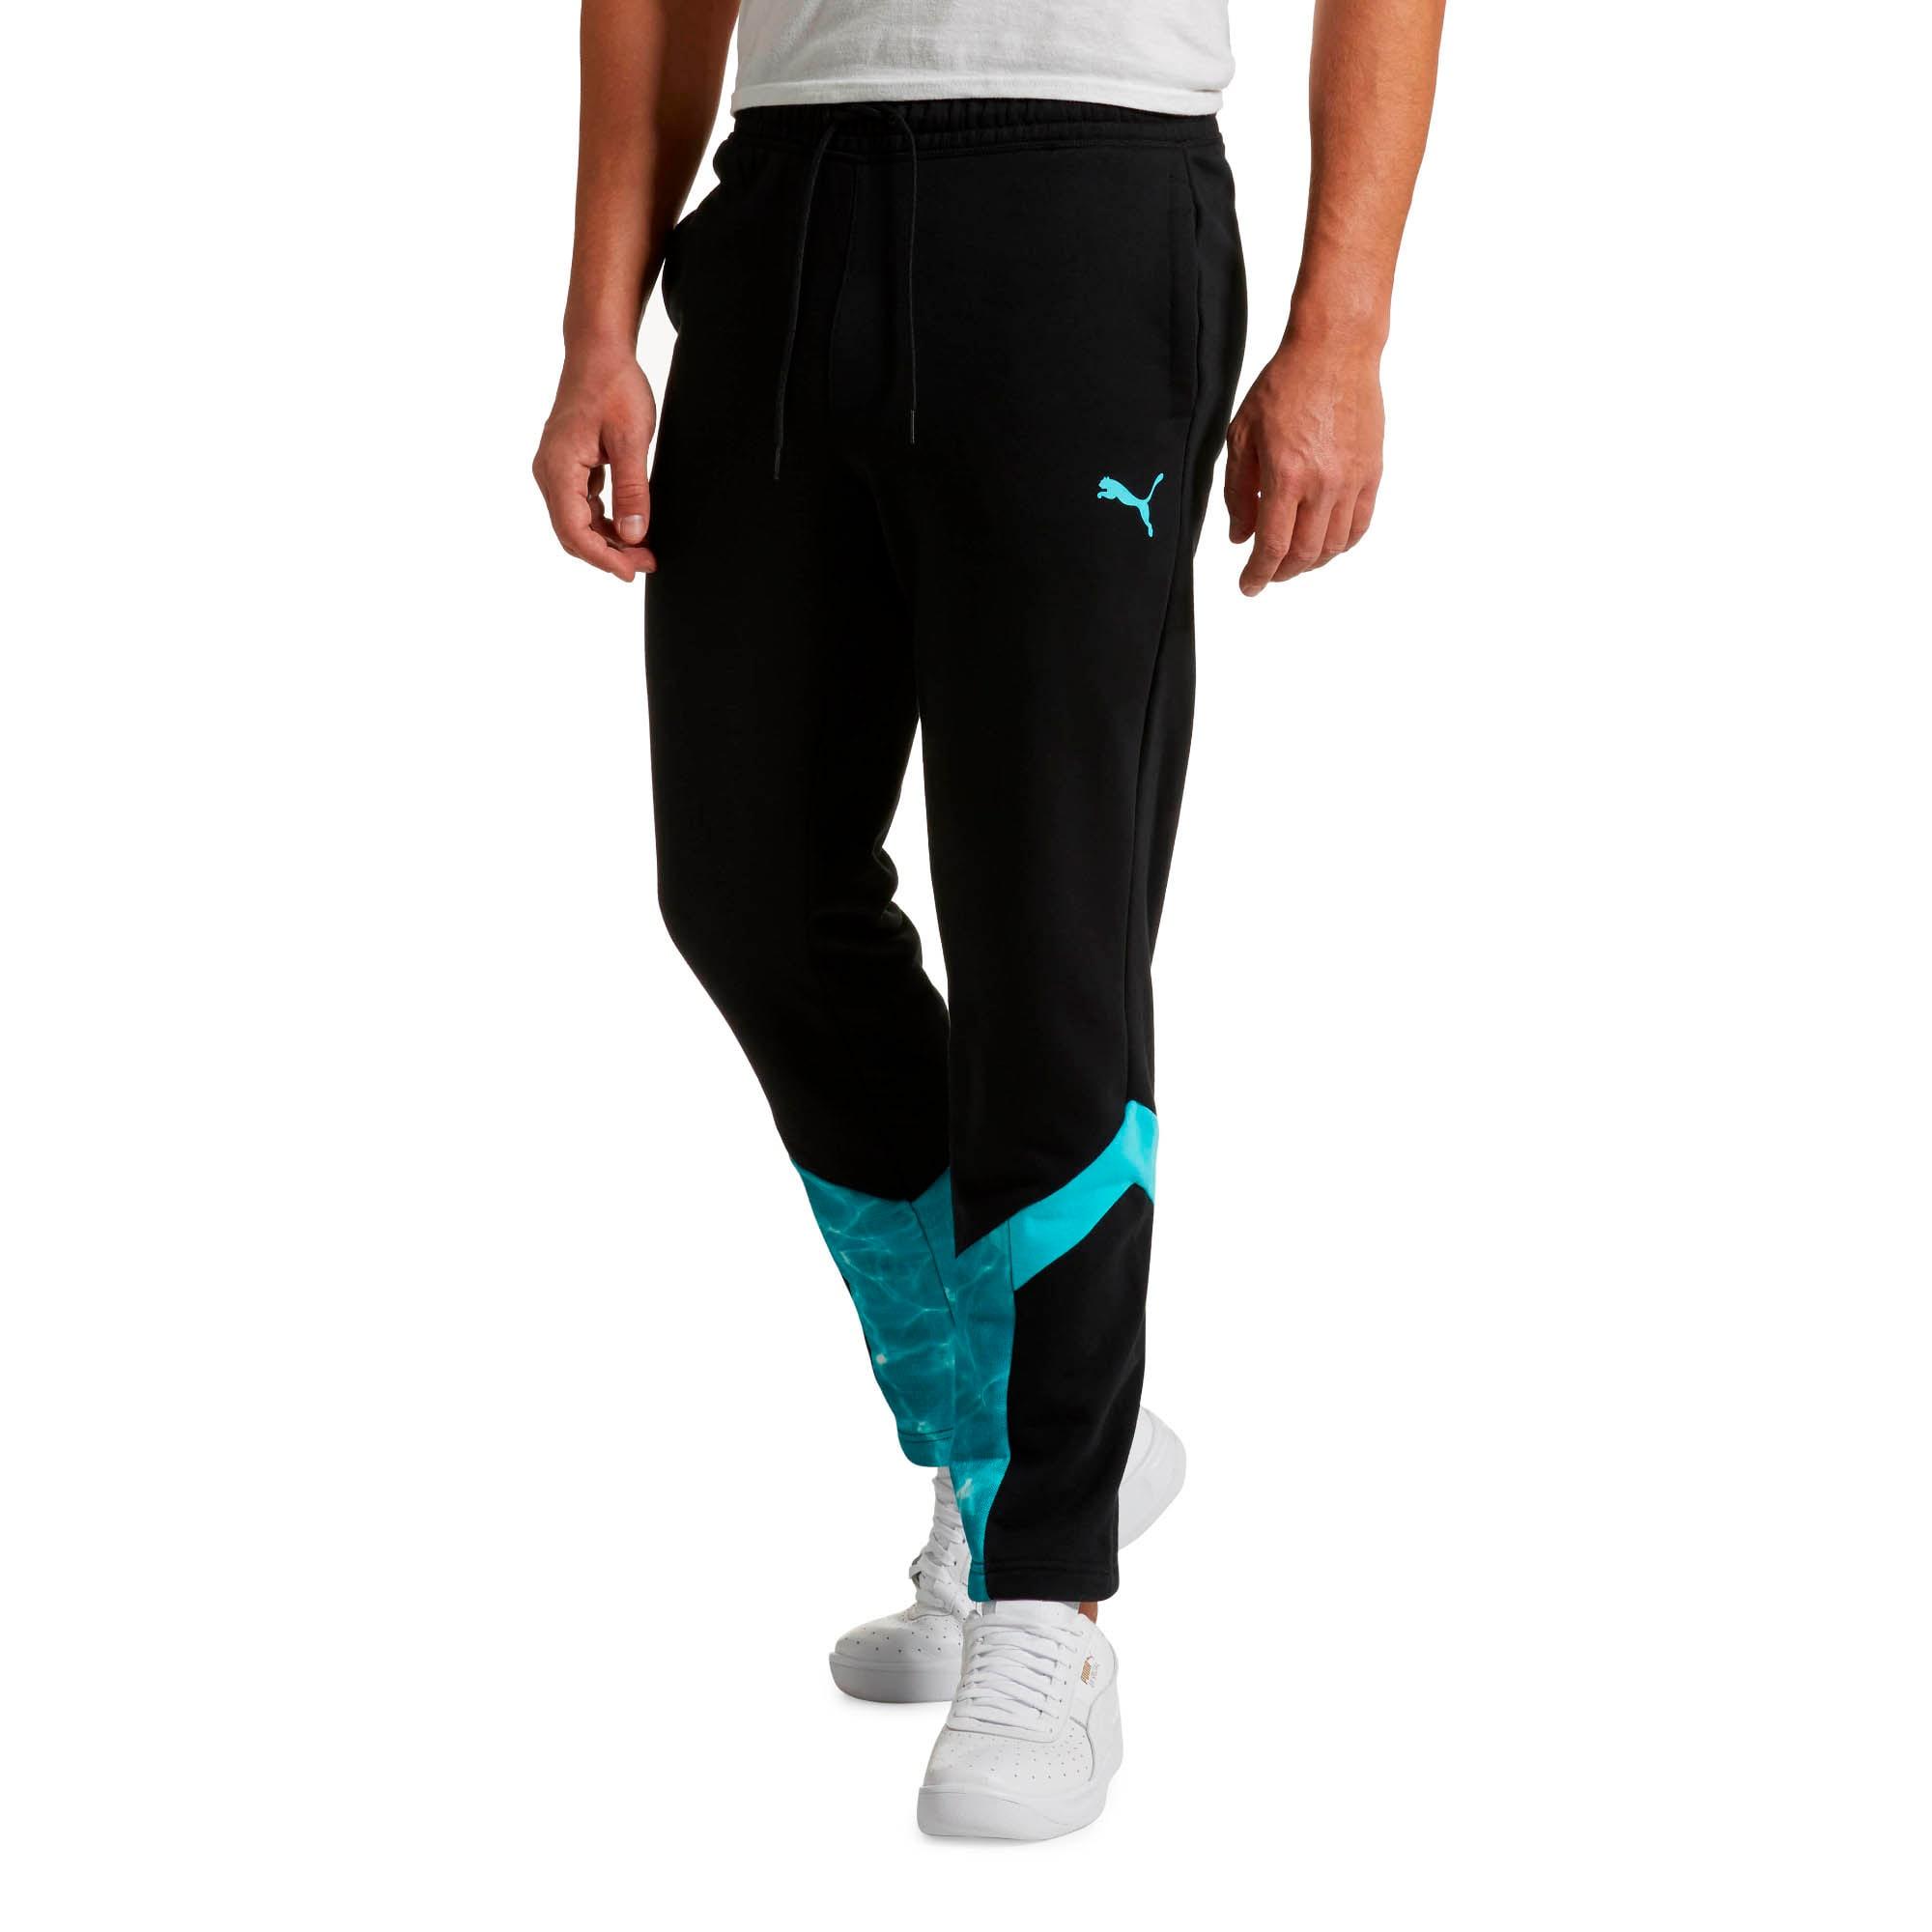 Thumbnail 2 of MCS Pool Men's Track Pants, Puma Black, medium